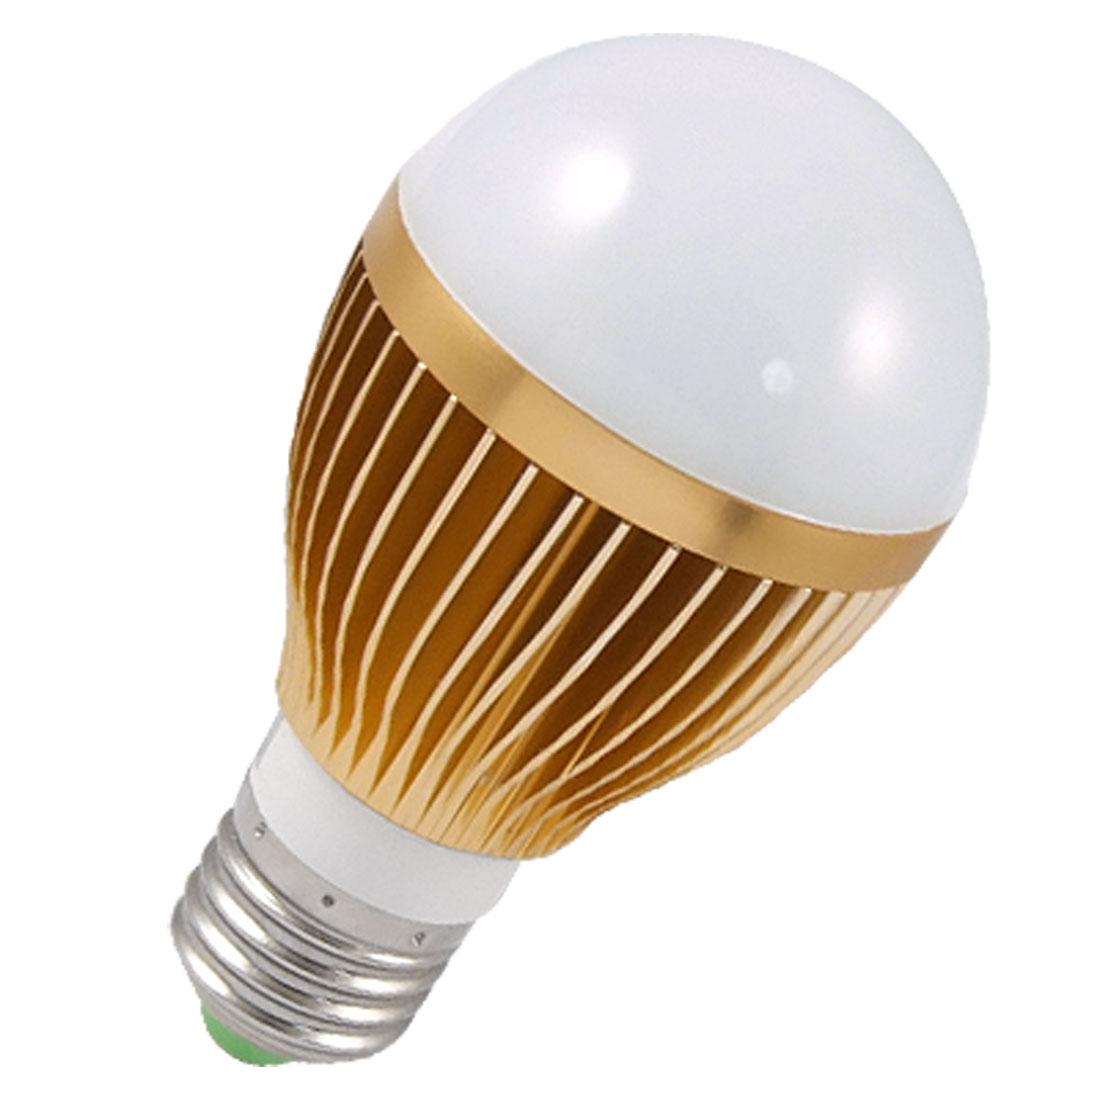 E27 Screw Base Gold Tone Shell White 5 LEDs Globe Bulb Light 5W AC 110-240V